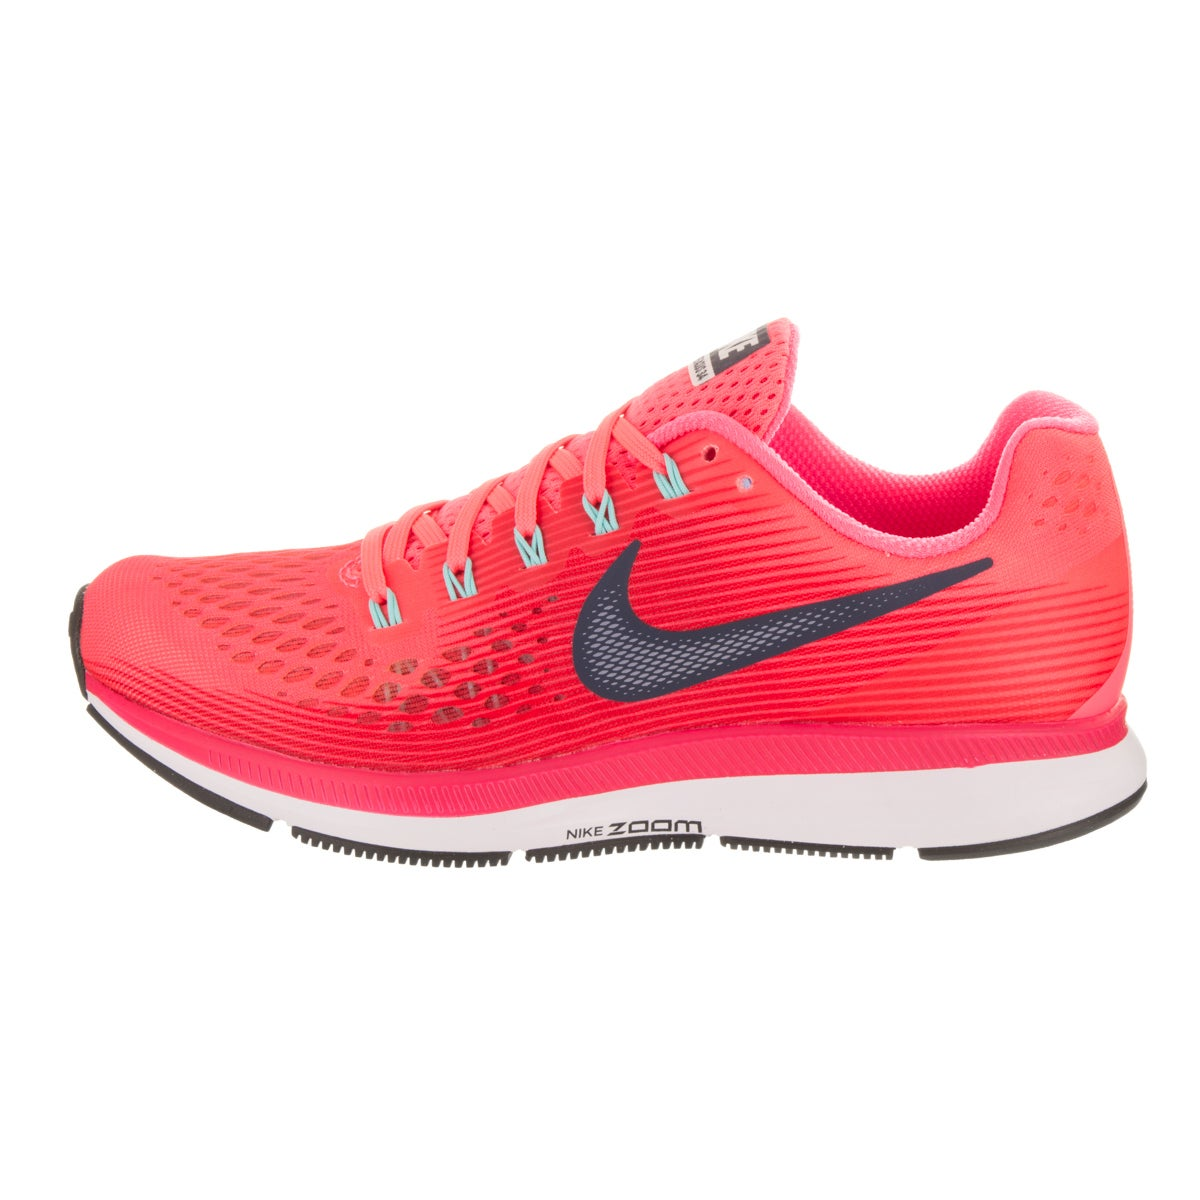 newest 2602e 2e61a Shop Nike Women s Air Zoom Pegasus 34 Running Shoe - Free Shipping Today -  Overstock - 16739461